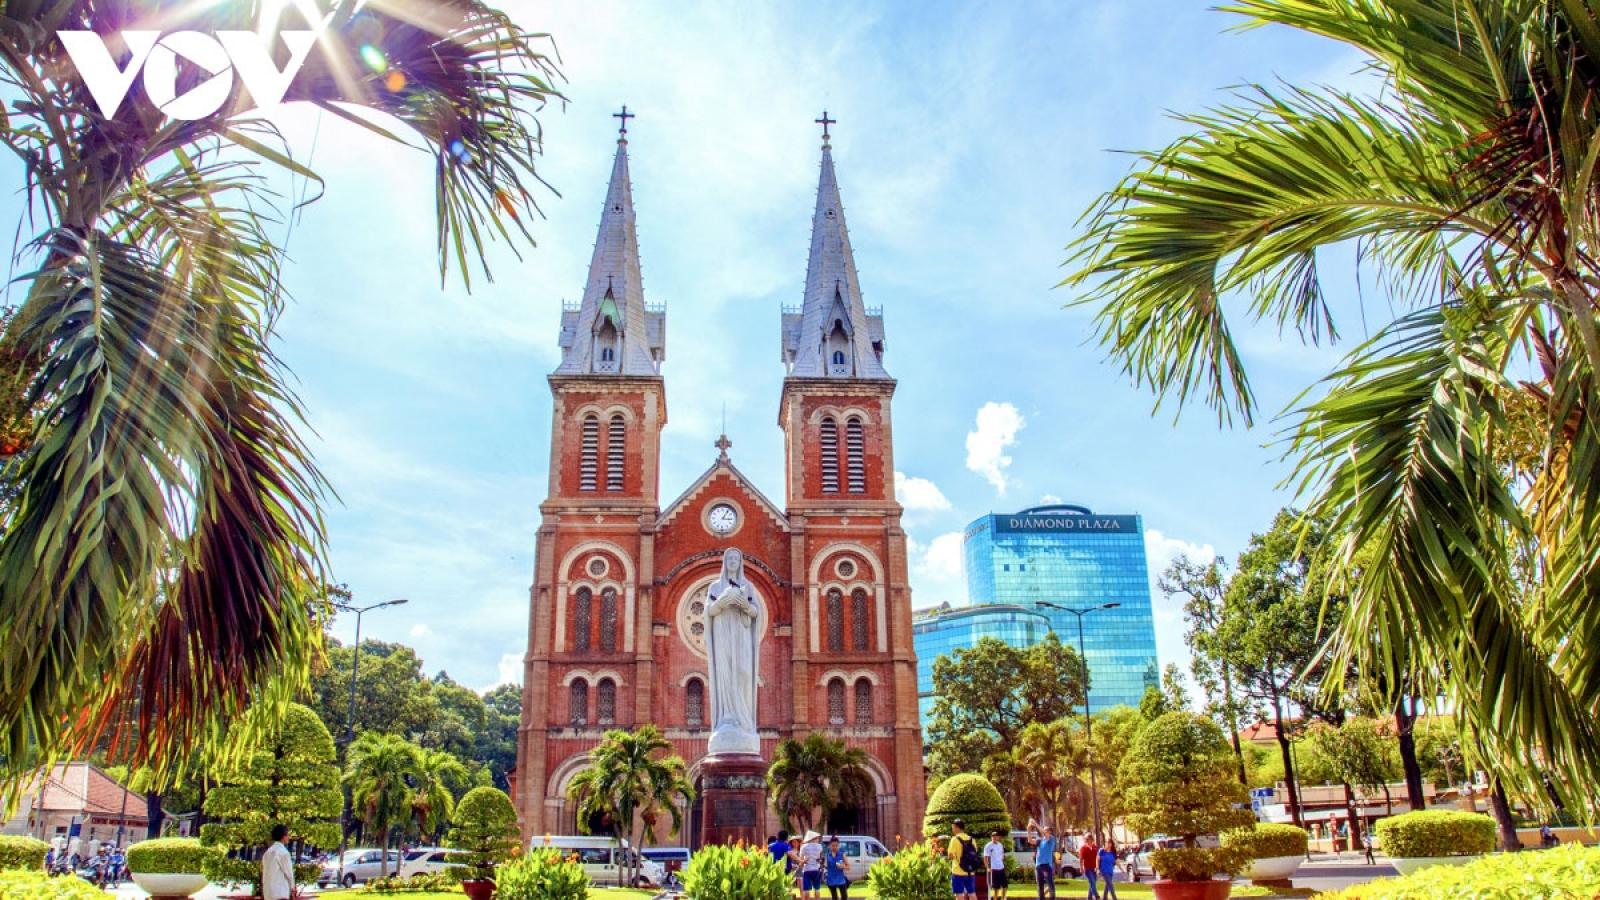 Vietnam among top 25 most viewed countries on TikTok